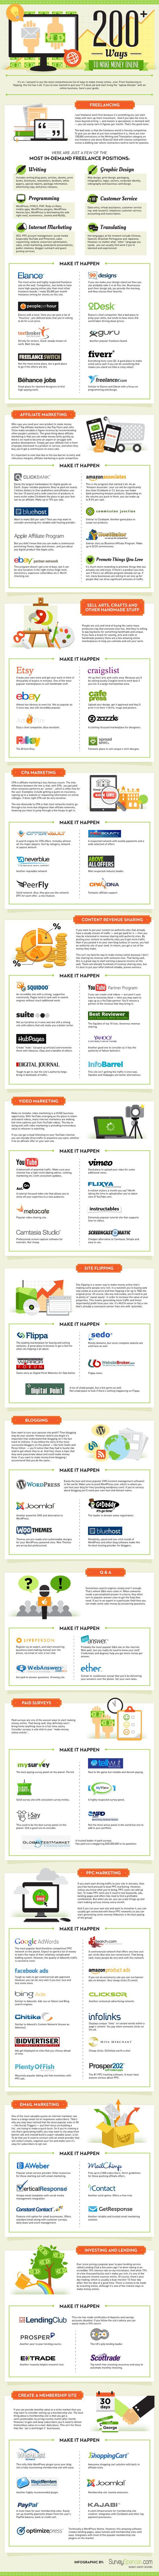 Make Money Online: 150+ Brilliant Ways #Infographic #MakeMoneyOnline #Money #EarnMoney